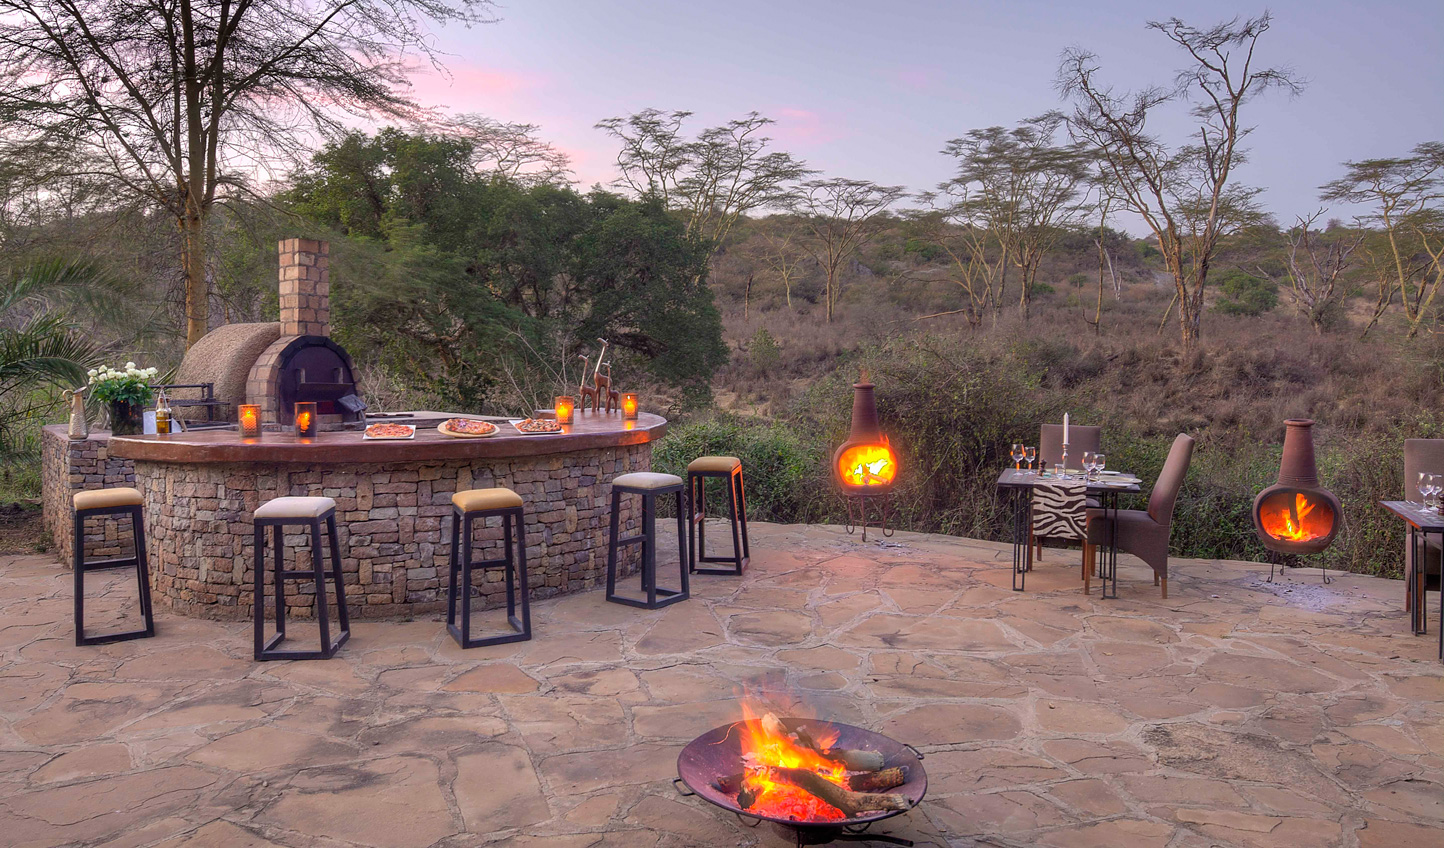 Kickstart your African adventure at The Emakoko